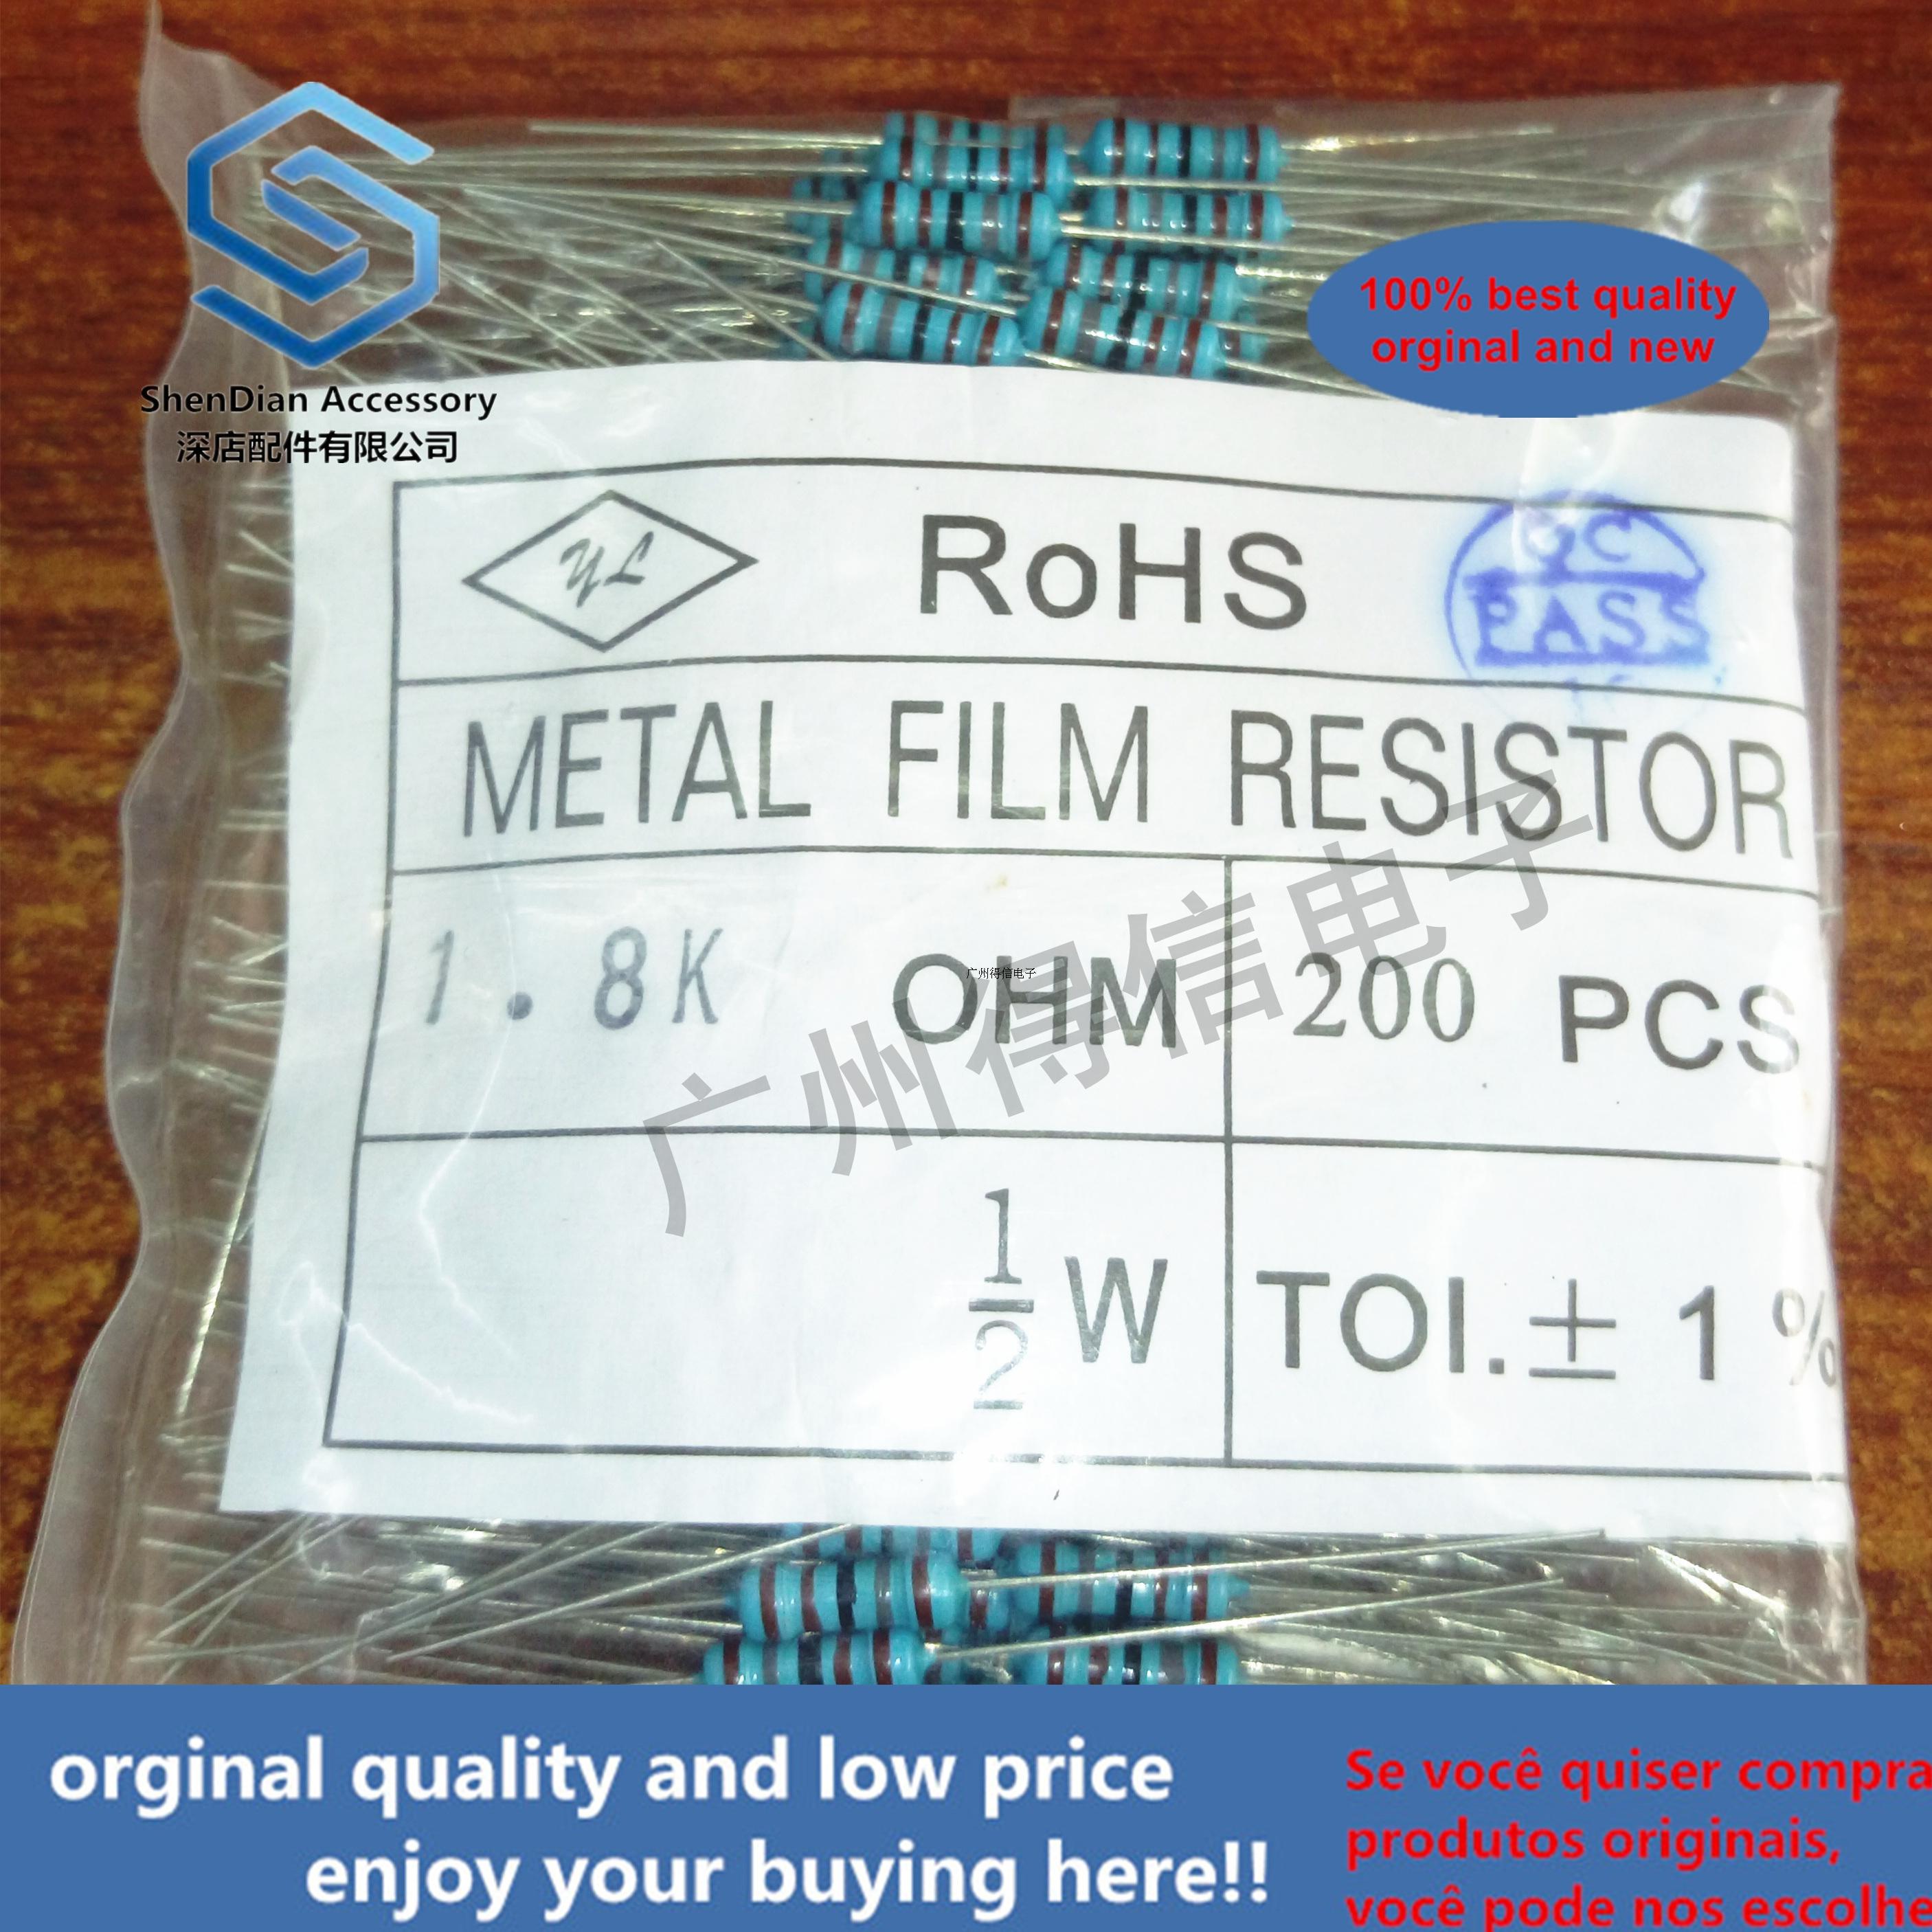 200pcs 1 / 2W 75R 75 Euro 1% Brand New Metal Film Iron Feet Resistor Bag 200 Pcs Per Pack